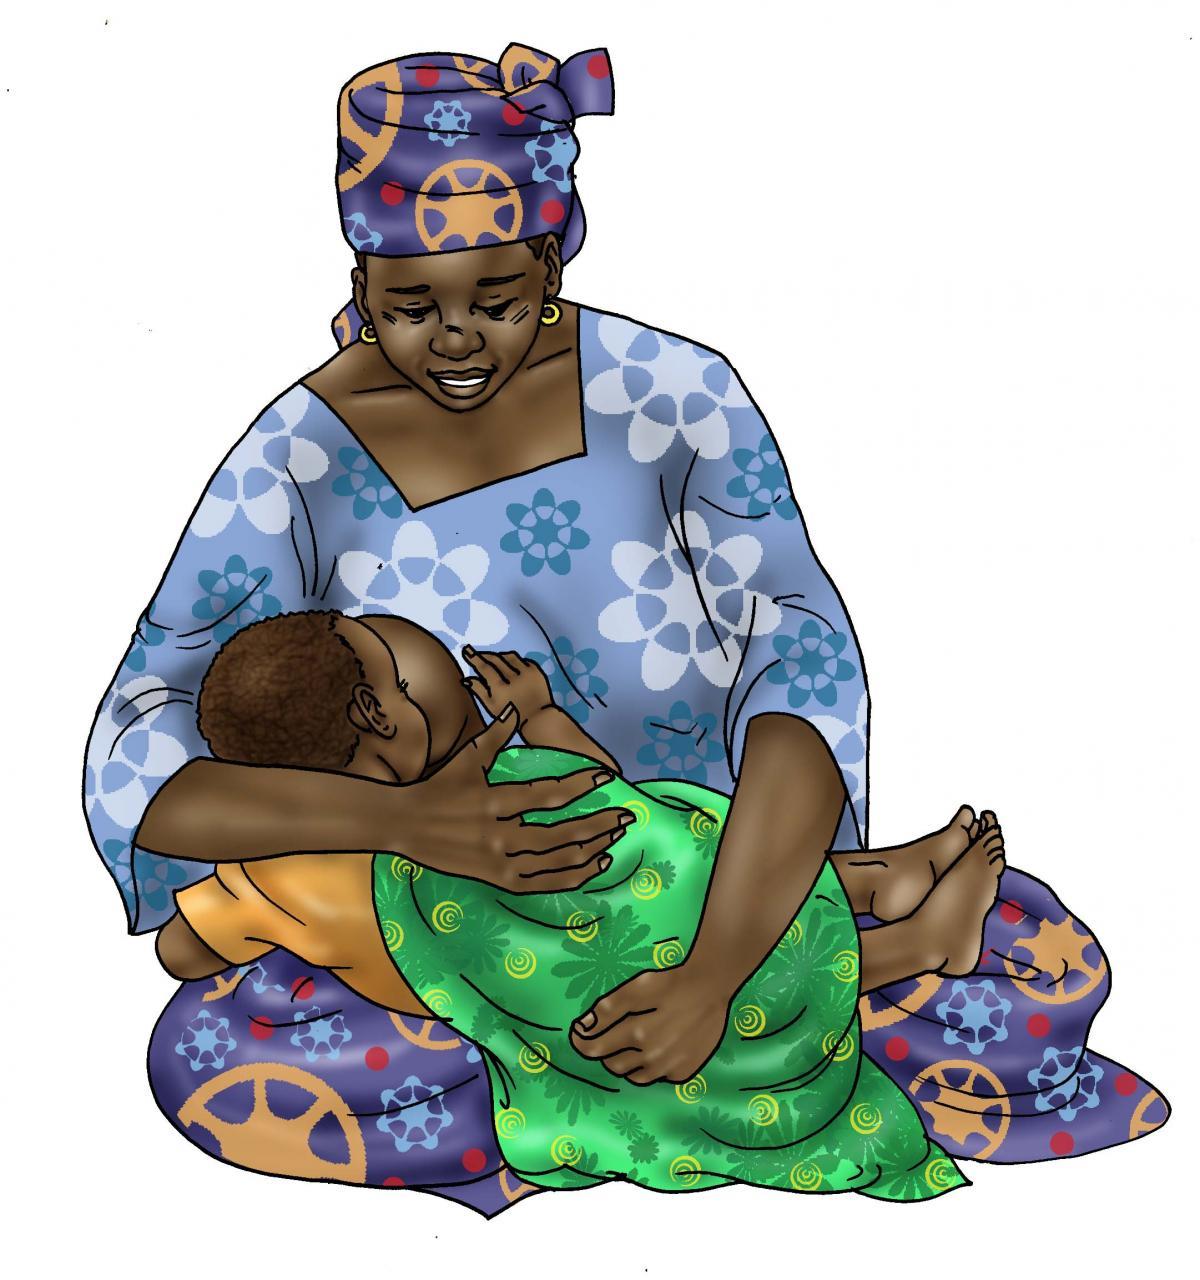 Breastfeeding - Breastfeeding positions 0-24 mo - 05 - Niger